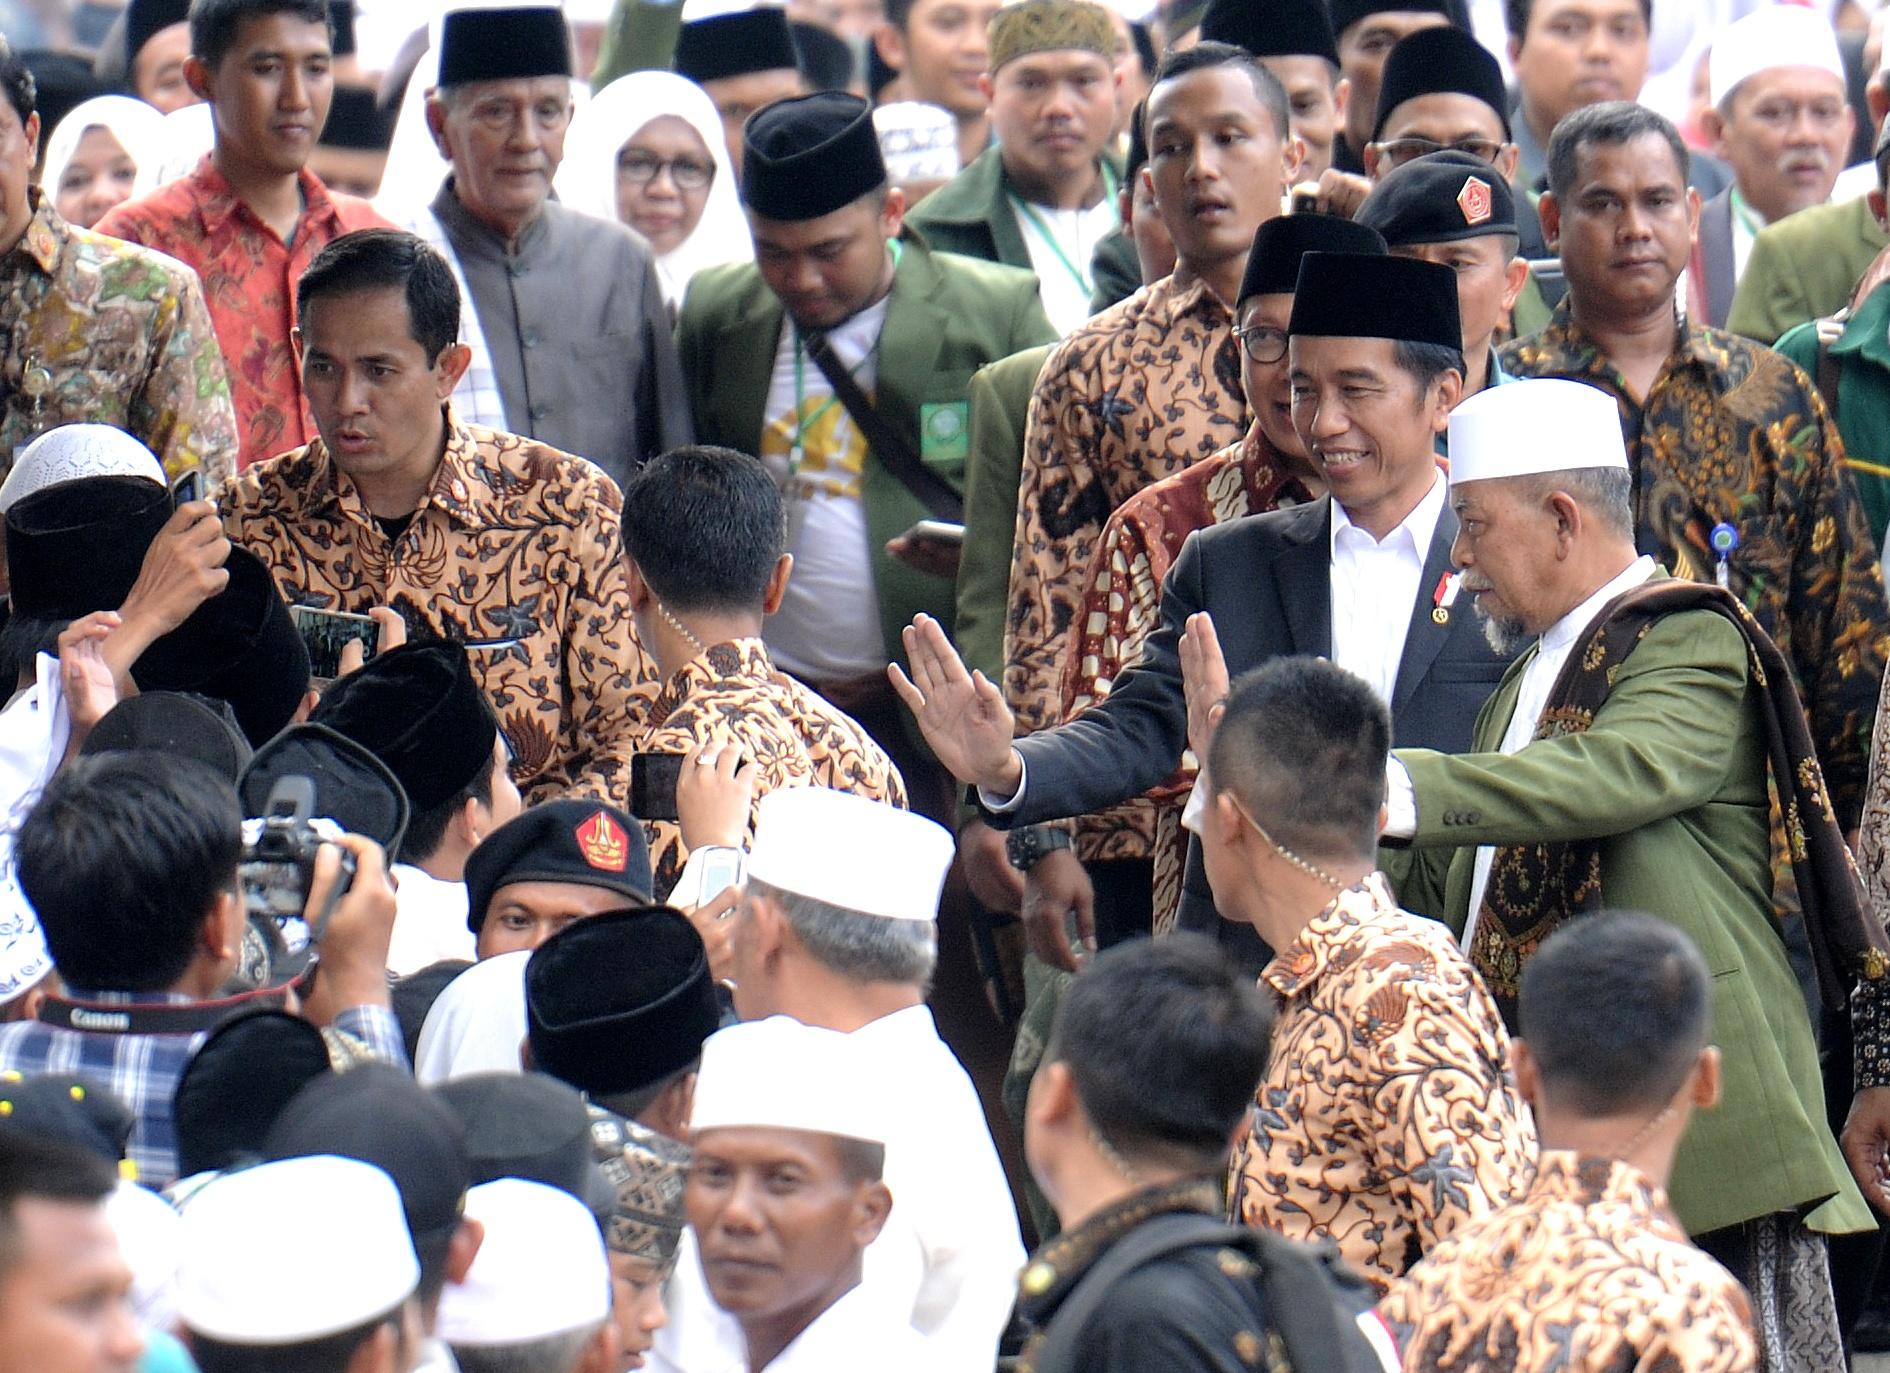 Presiden Jokowi menyapa masyarakat yang turut menghadiri peringatan Isra Mi'raj tahun 2017 di Pondok Pesantren Al Hikamussalafiyah, Cipulus, Kecamatan Wanayasa, Kabupaten Purwakarta, Jawa Barat, Selasa (25/4). (Foto: Humas/Agung)